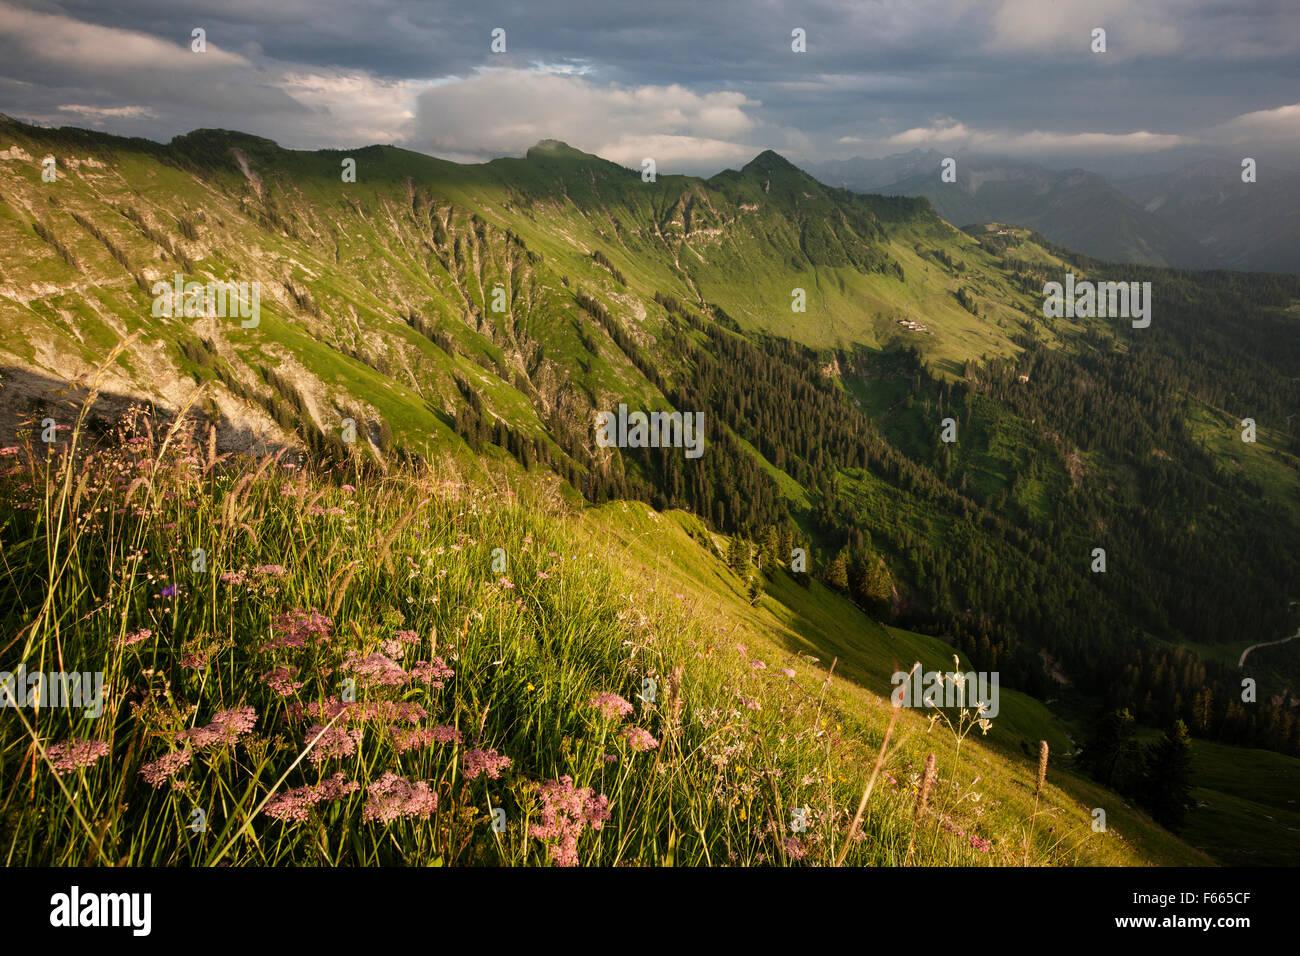 Las praderas alpinas en verano, Karwendel, tormentosa atmósfera, Tirol, Austria Imagen De Stock